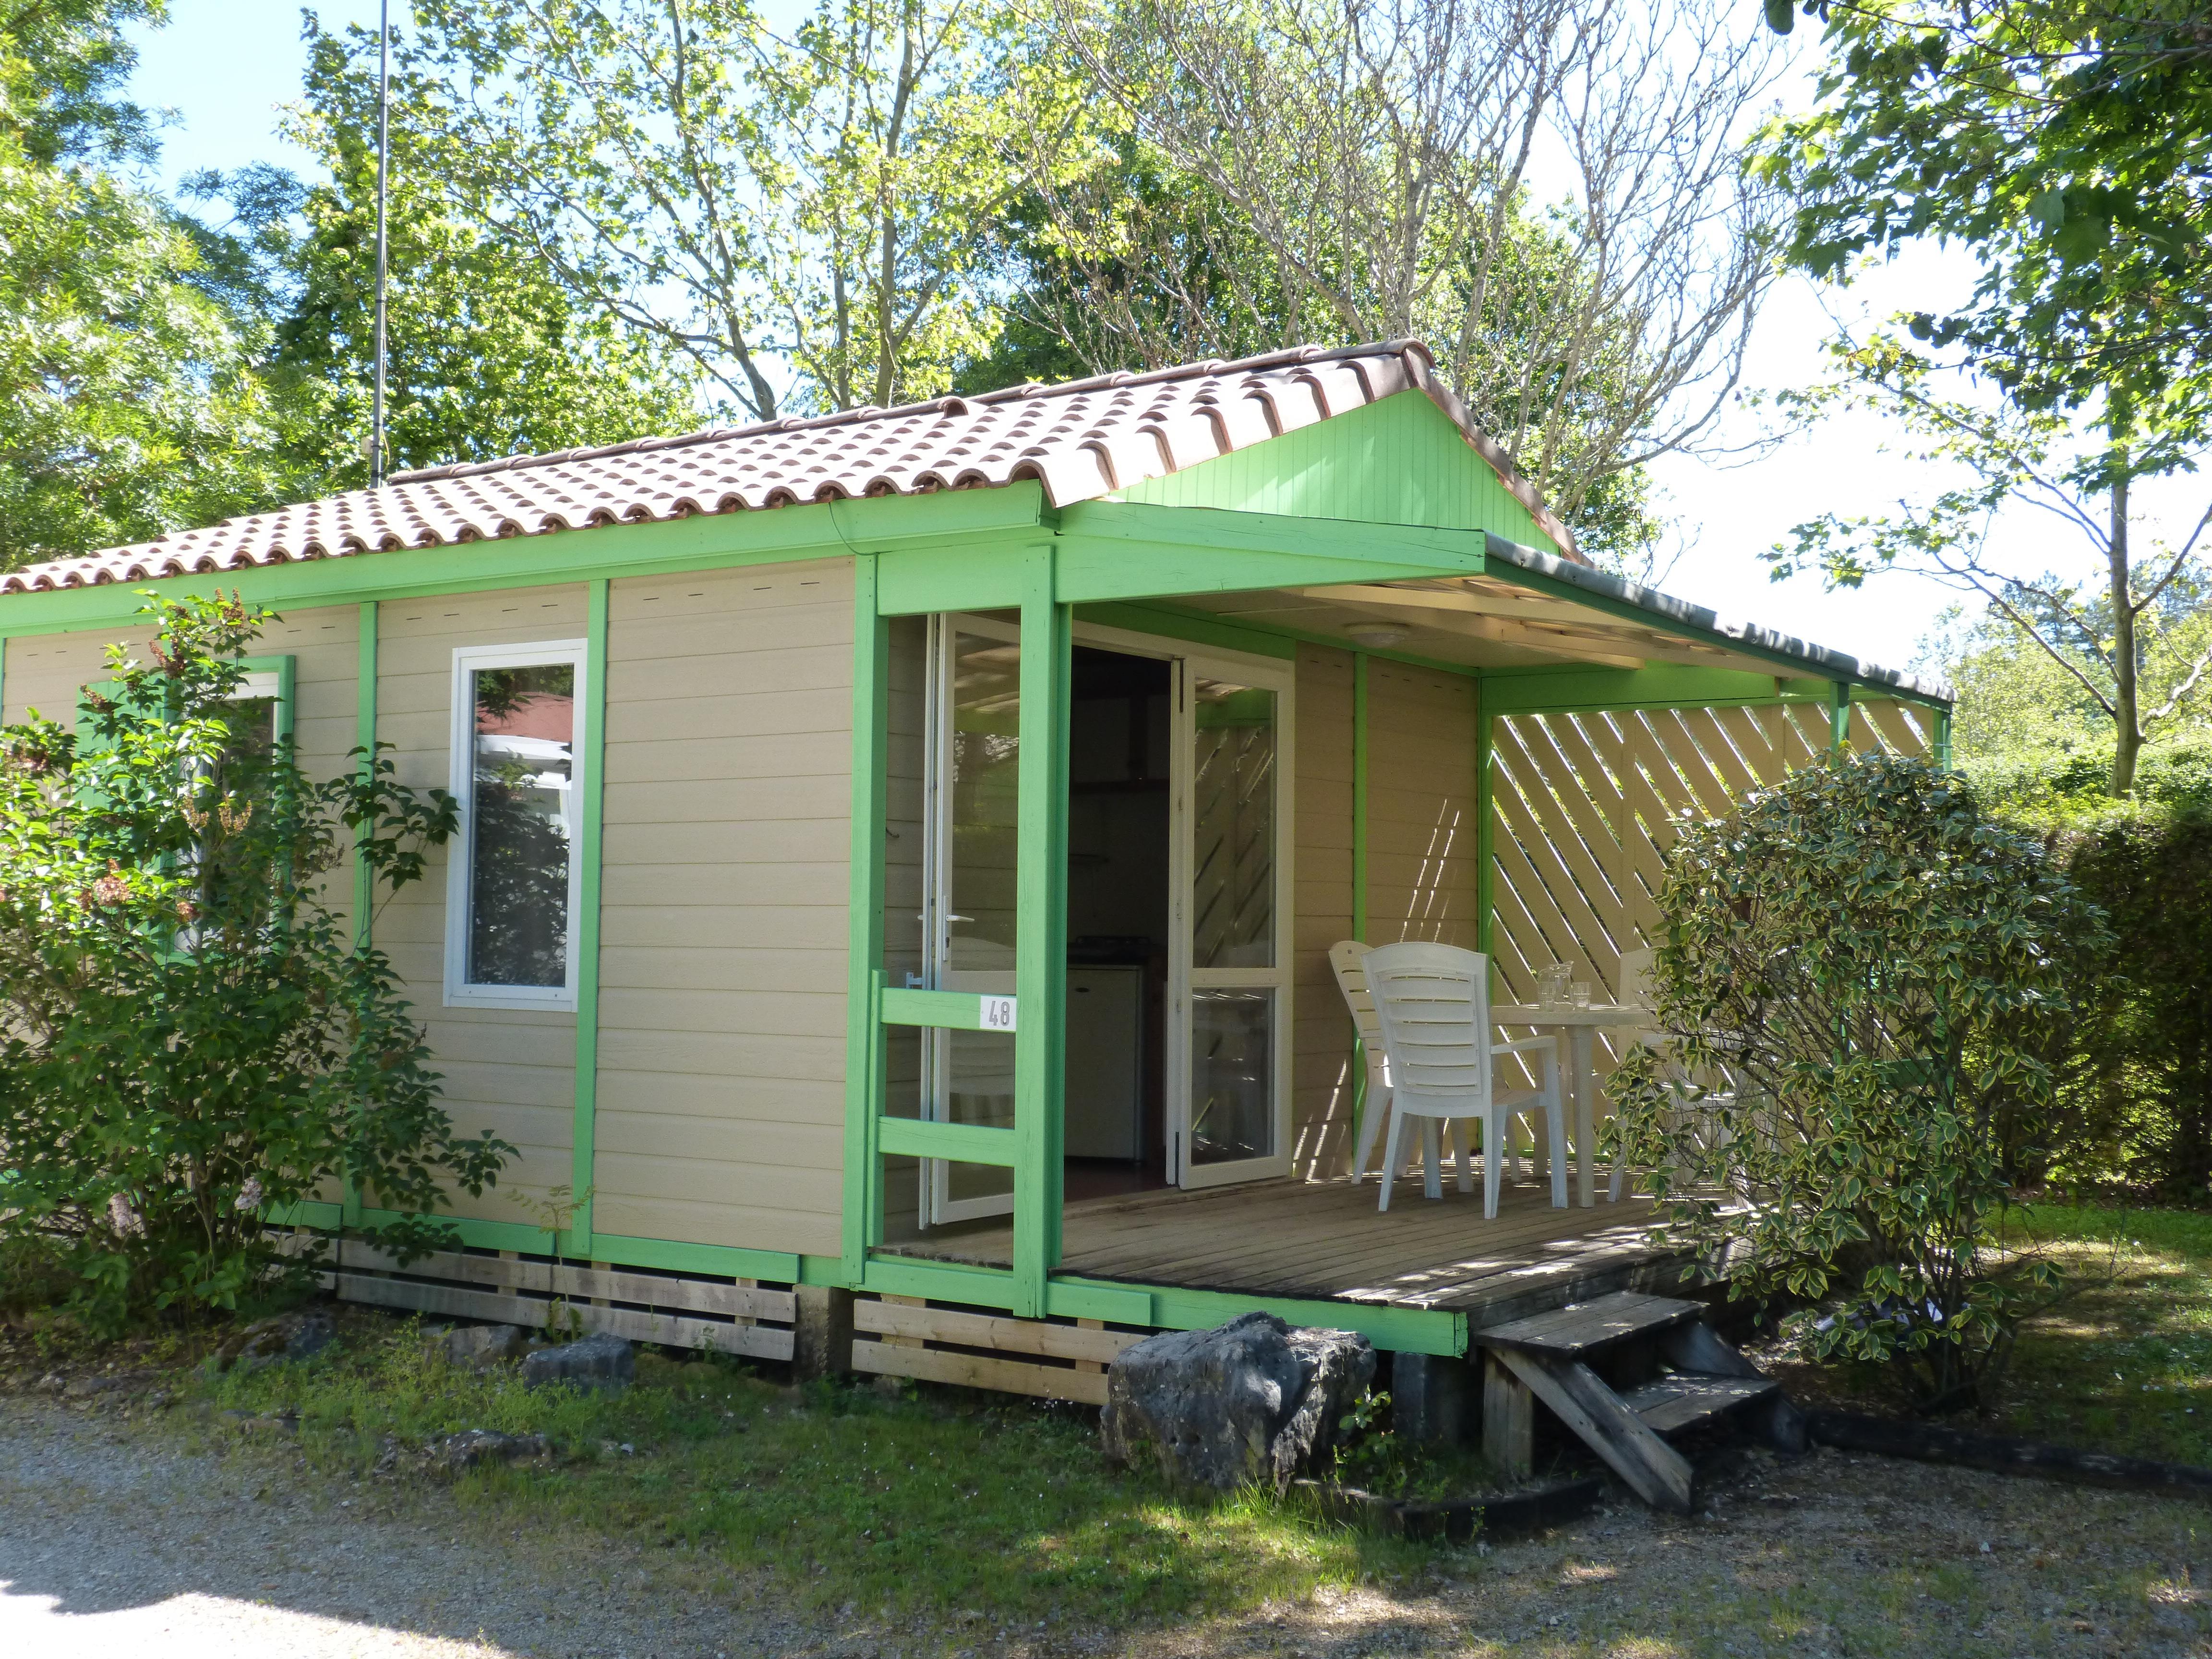 Chalet 22m² - 2 chambres + terrasse couverte 10m²